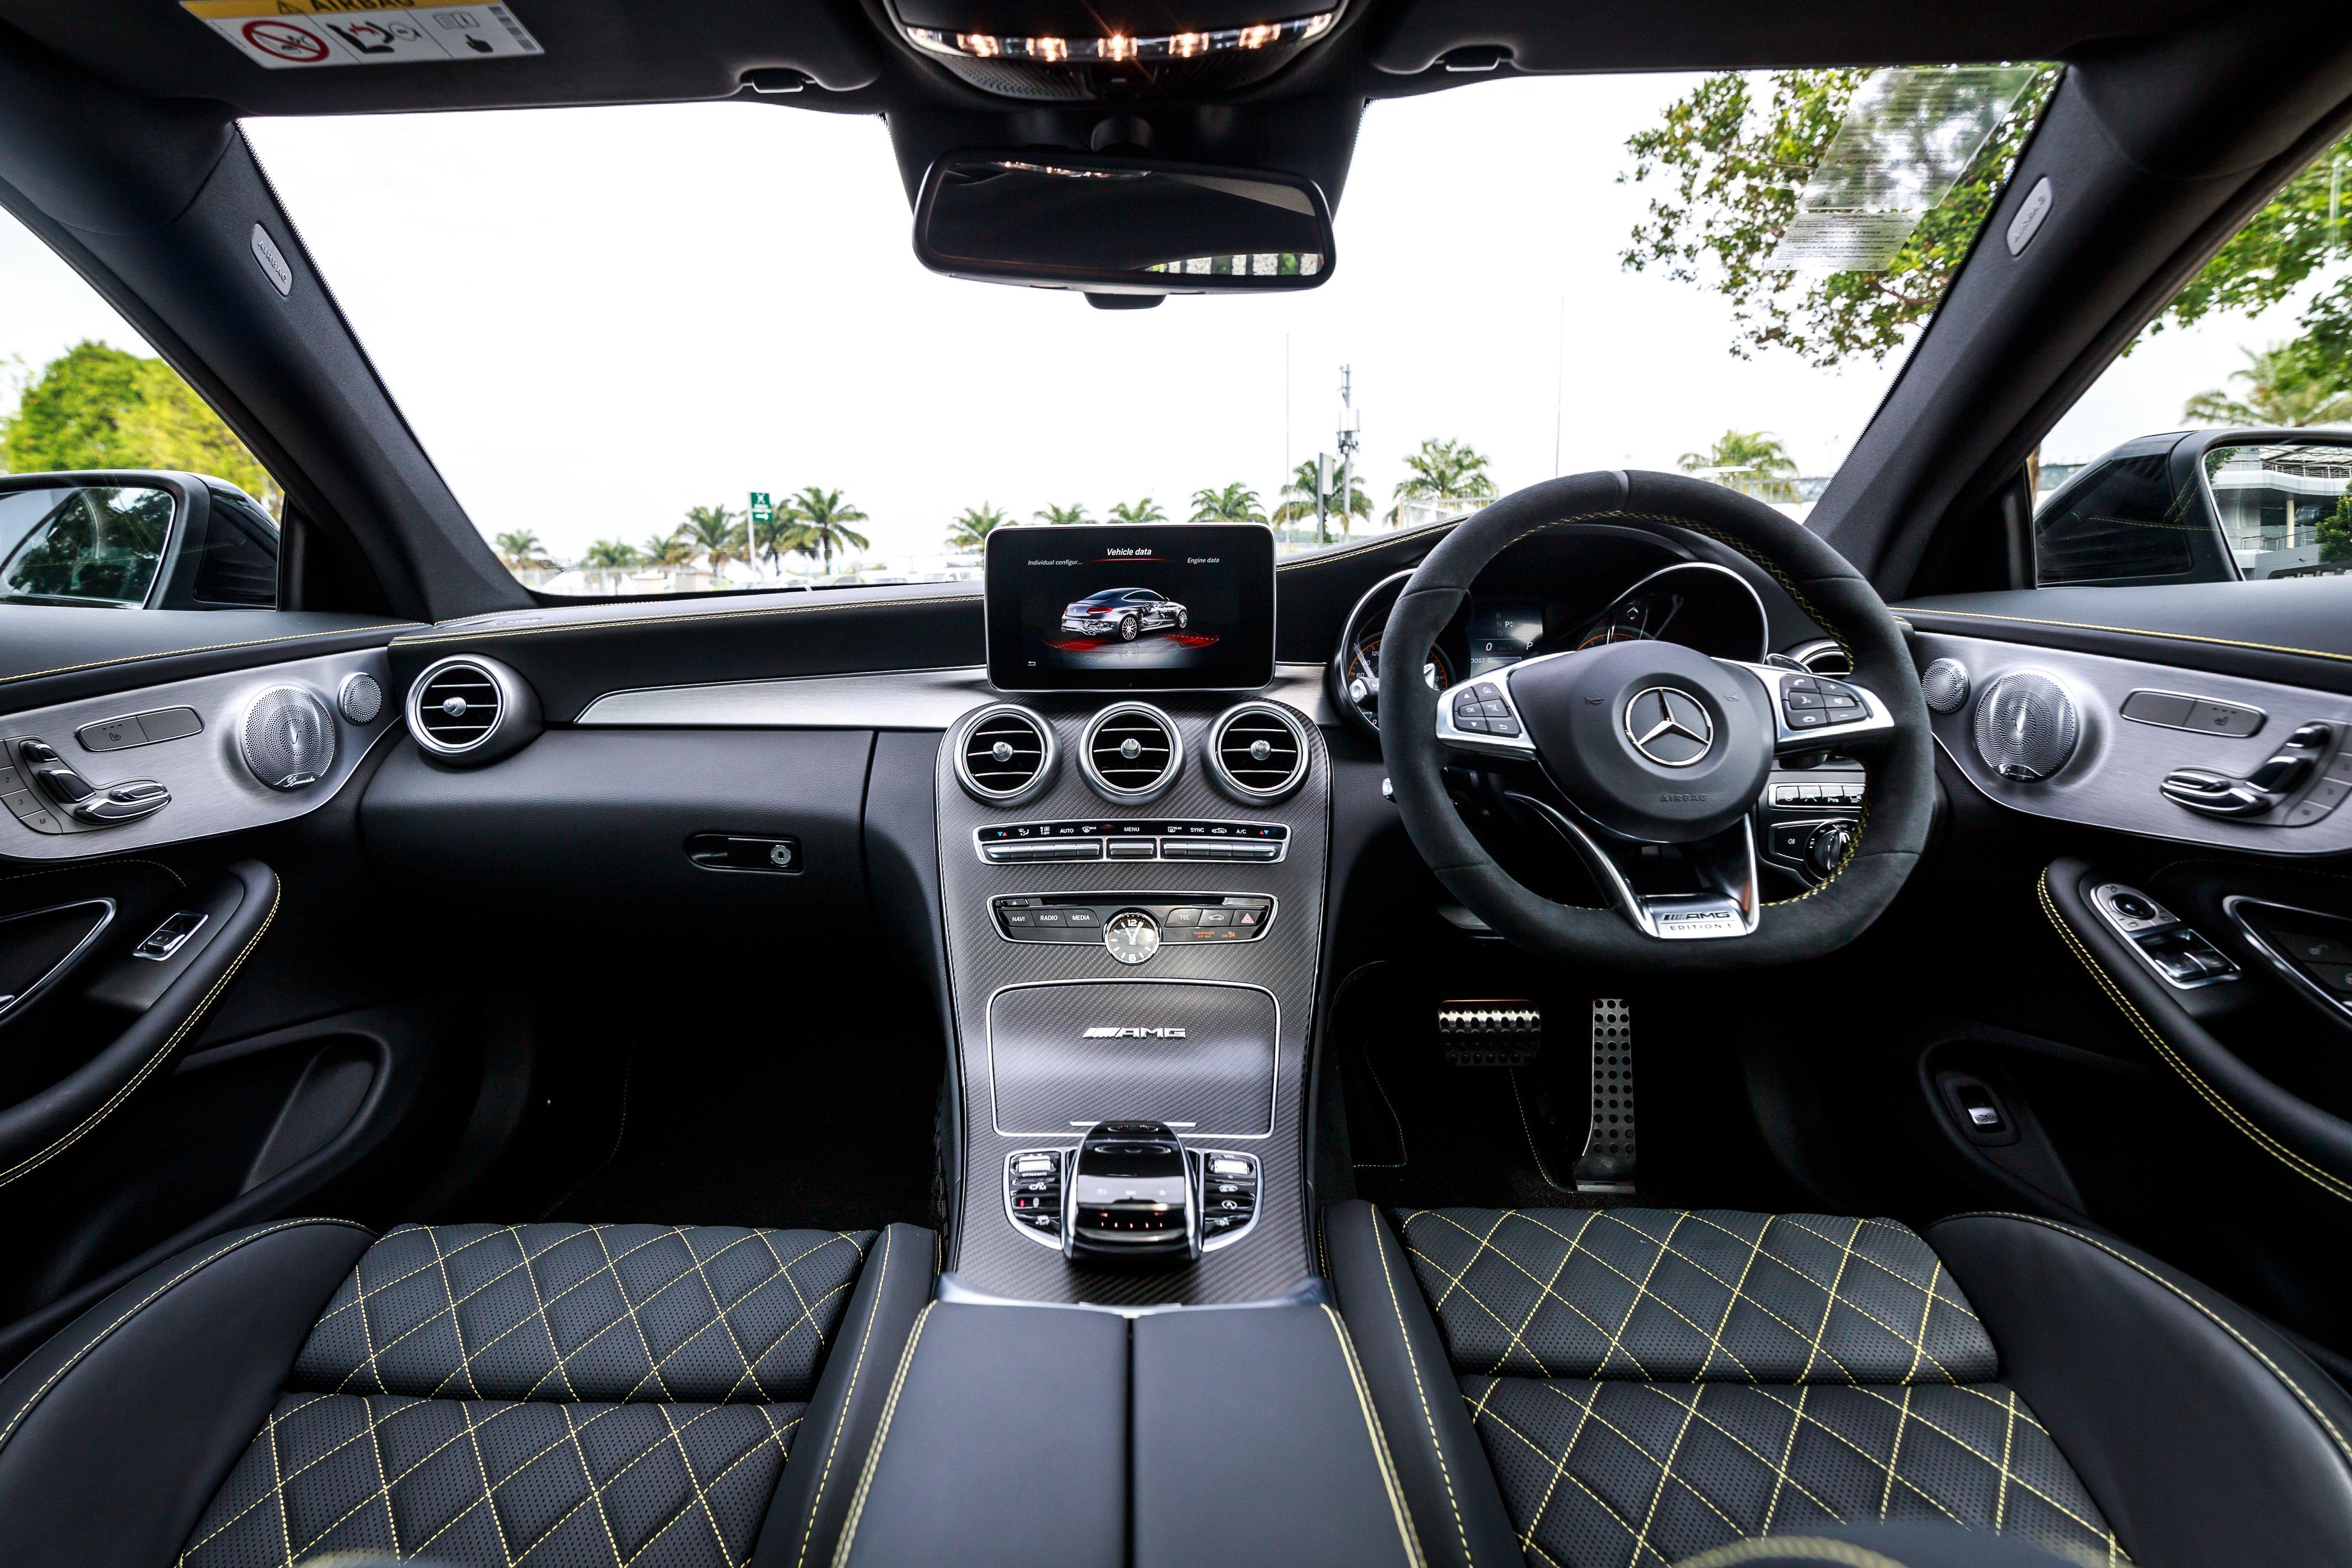 Mercedes Amg C63 S Coupe 本地上市,从rm773k起! Mercedes Amg C 63